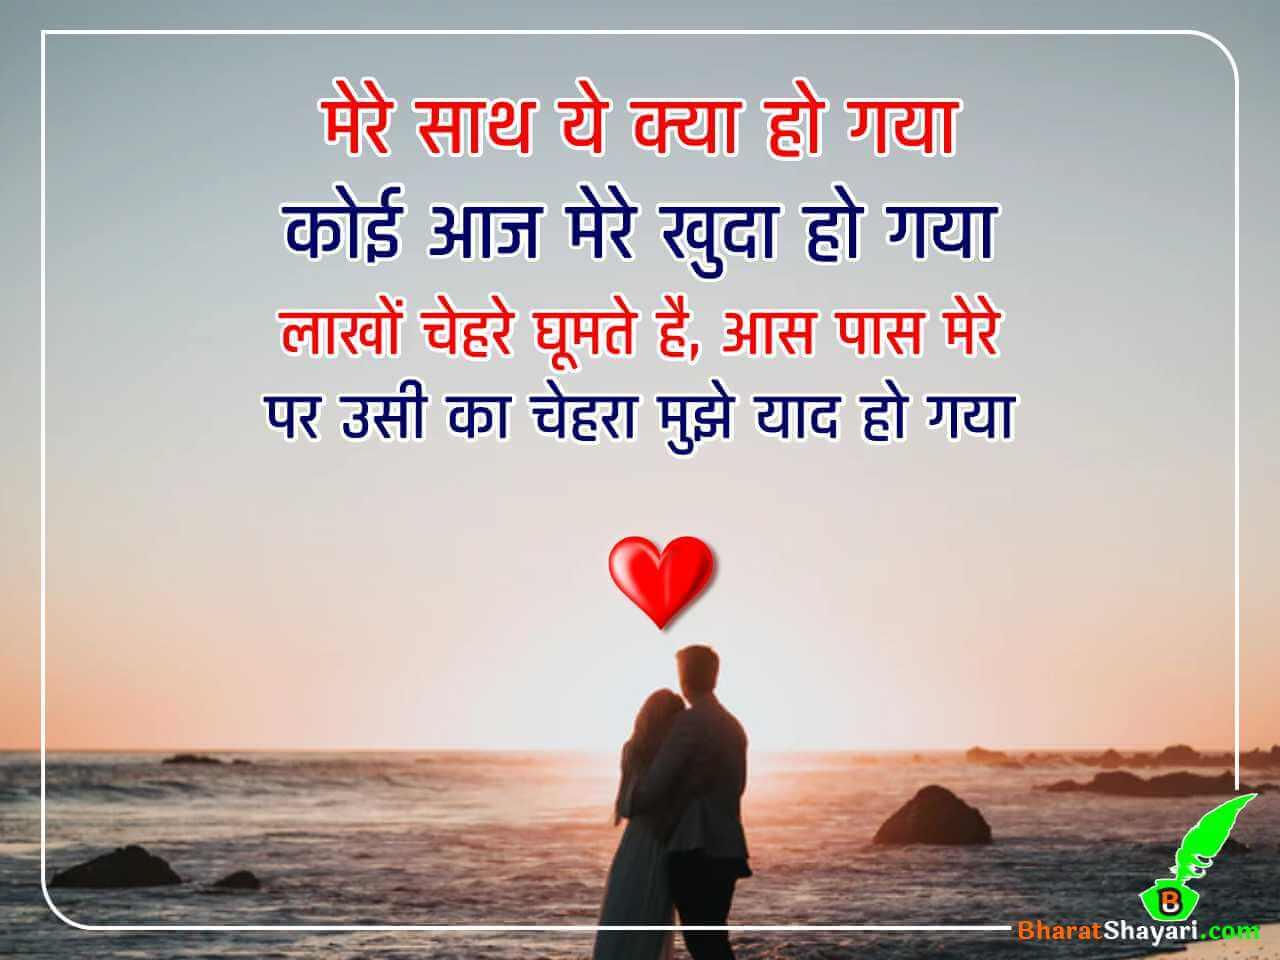 Mere sath ye kya ho gya - Hindi Love Shayari